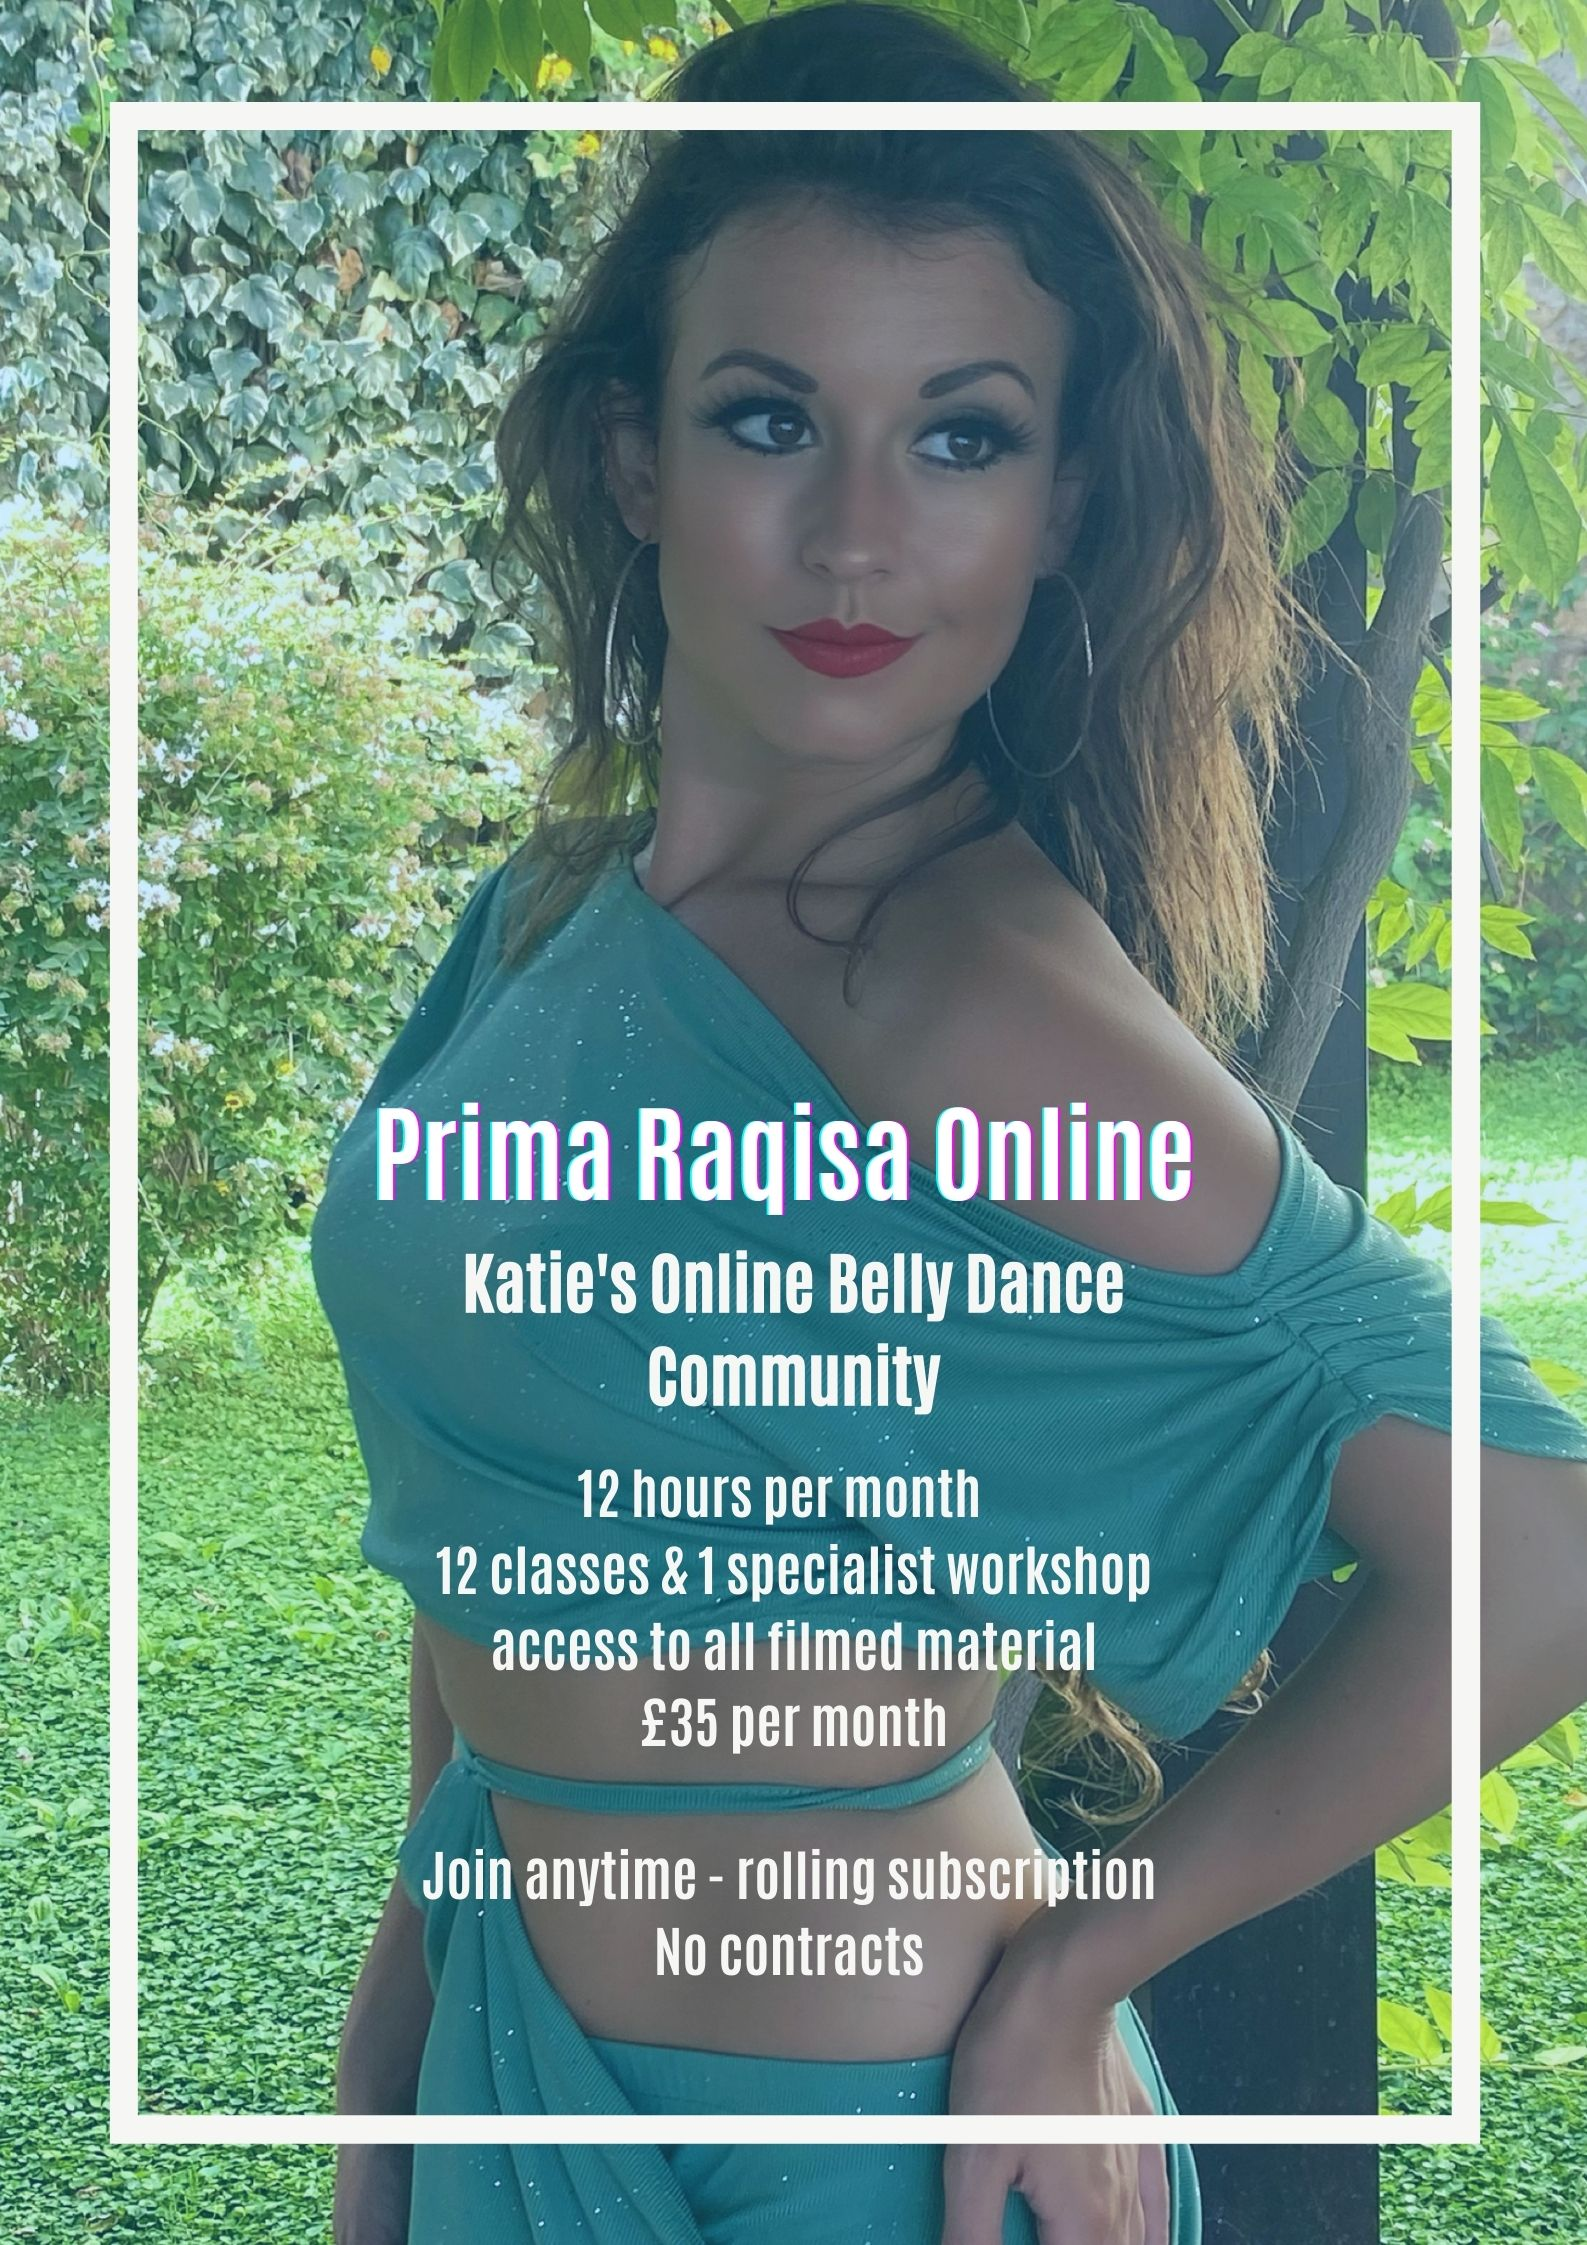 Prima Raqisa Online